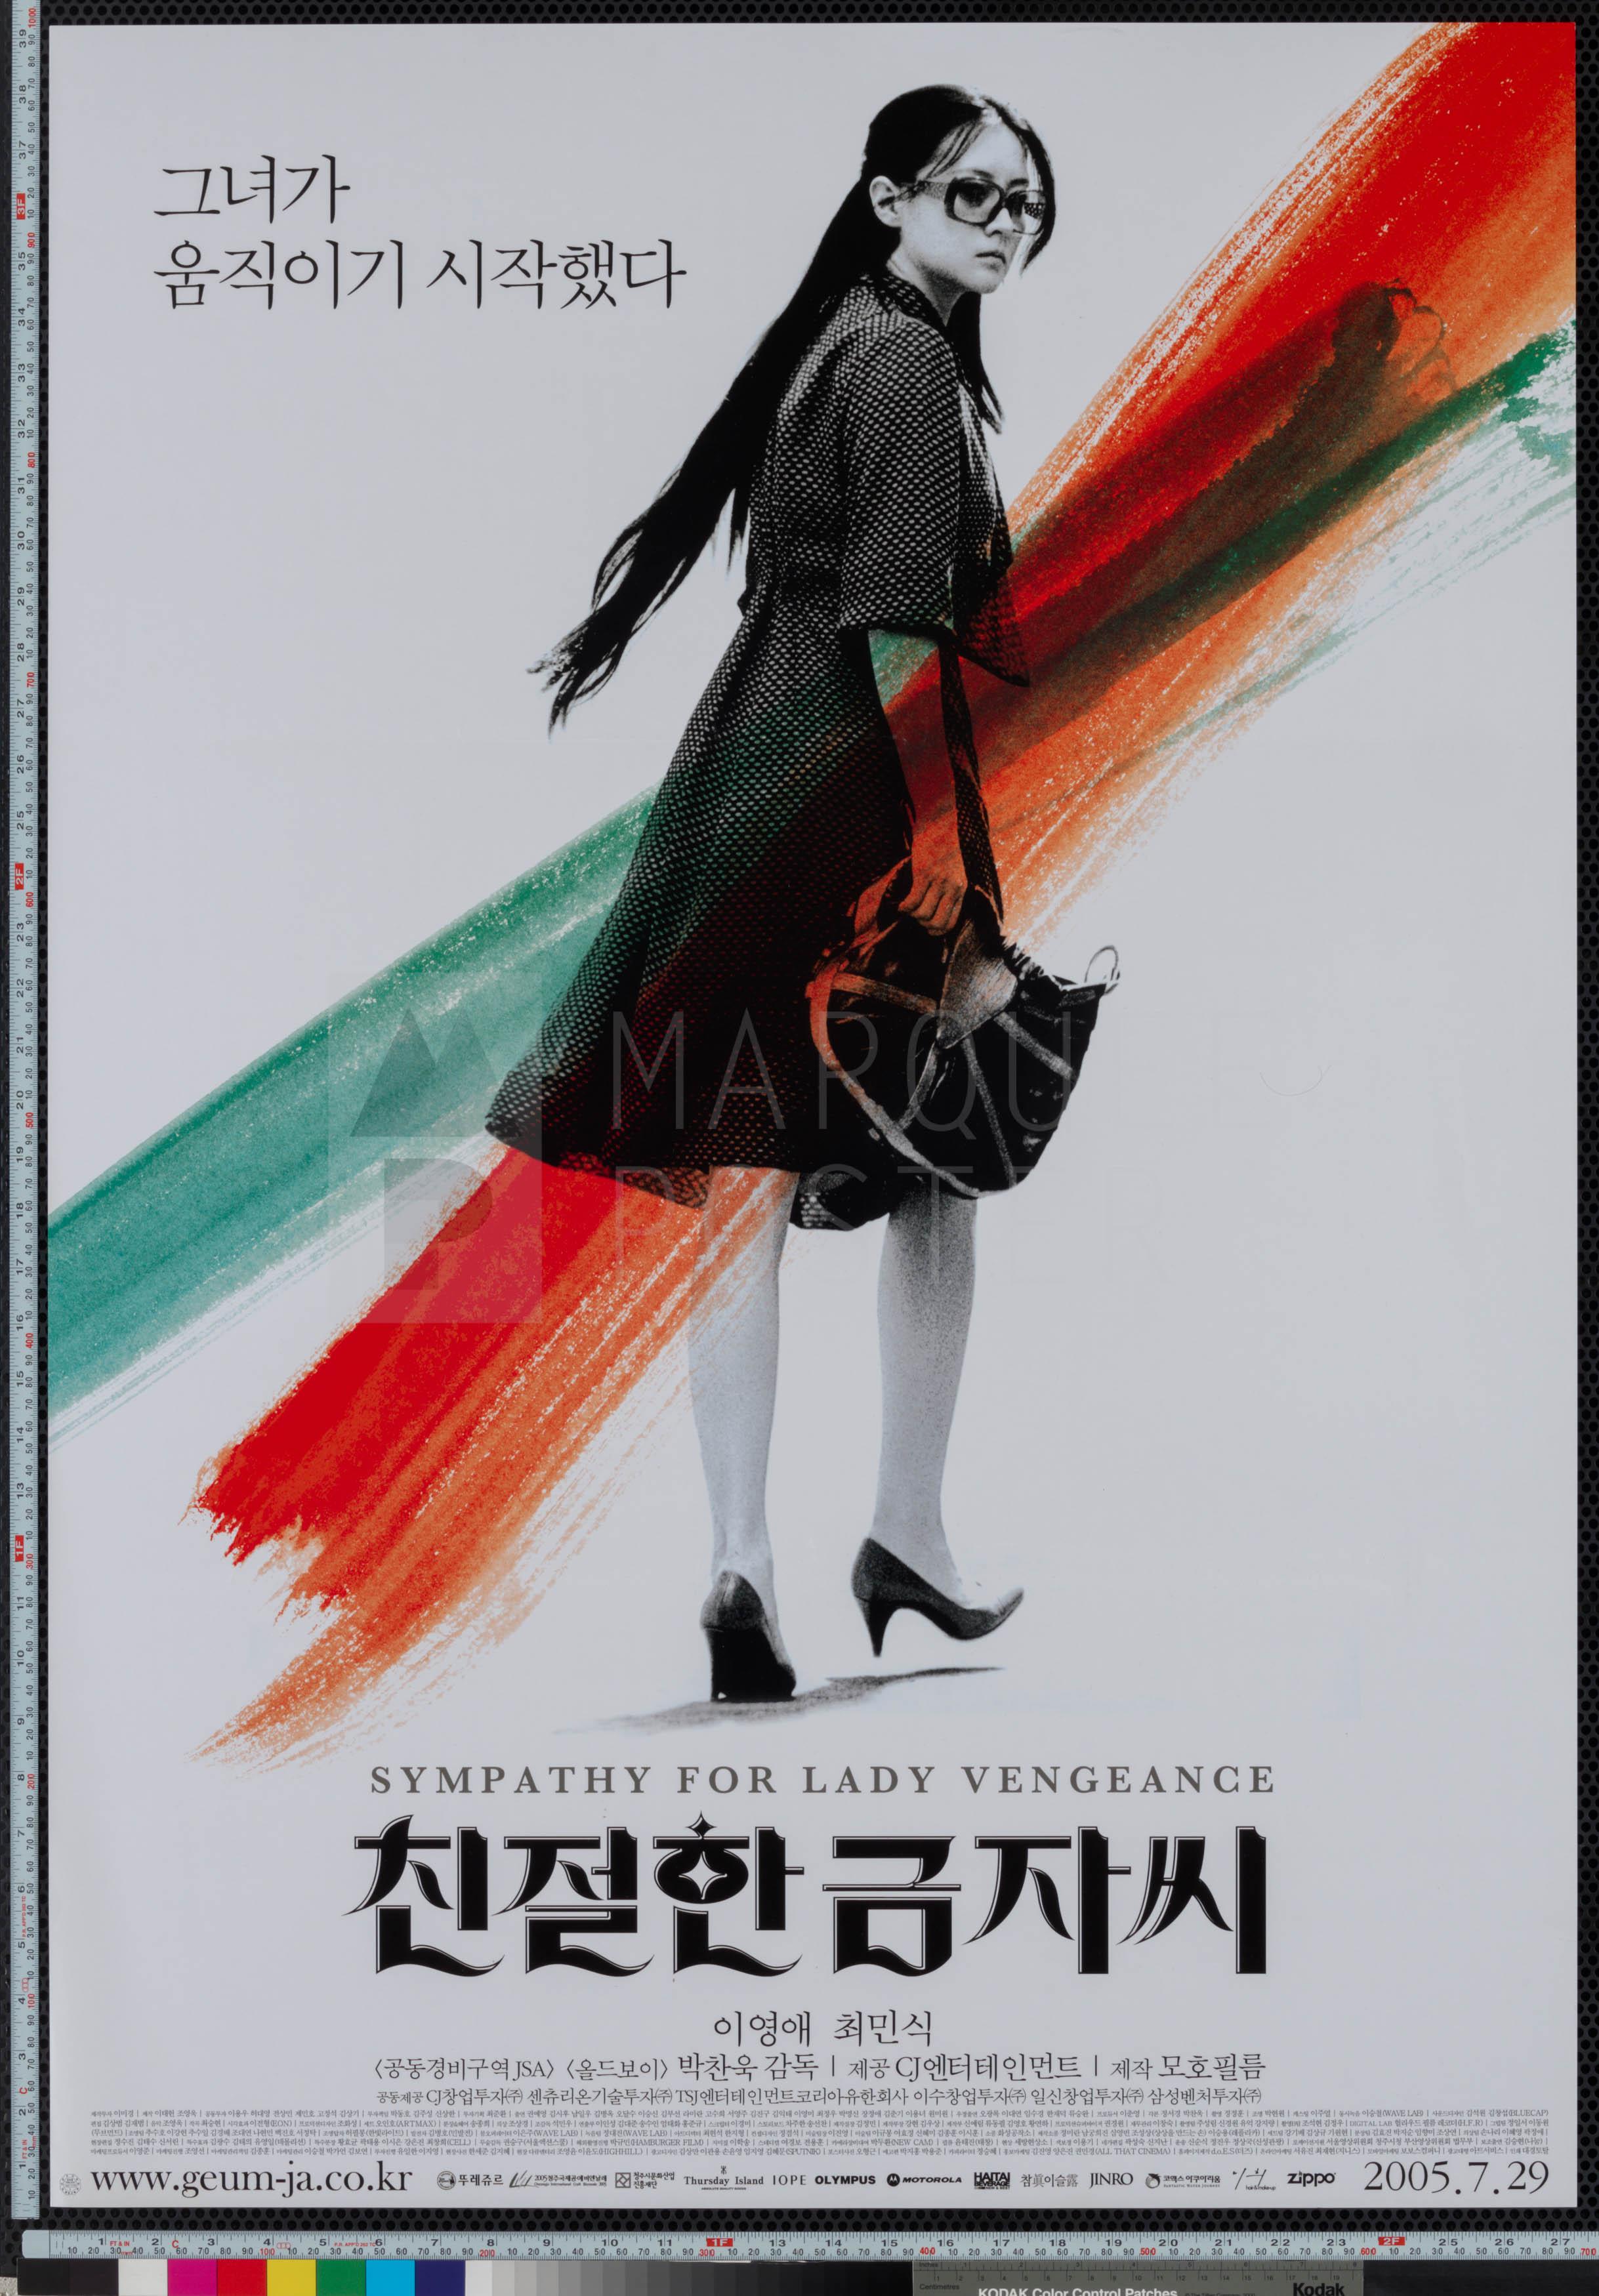 Korean poster design - 58 Sympathy For Lady Vengeance White Background Style